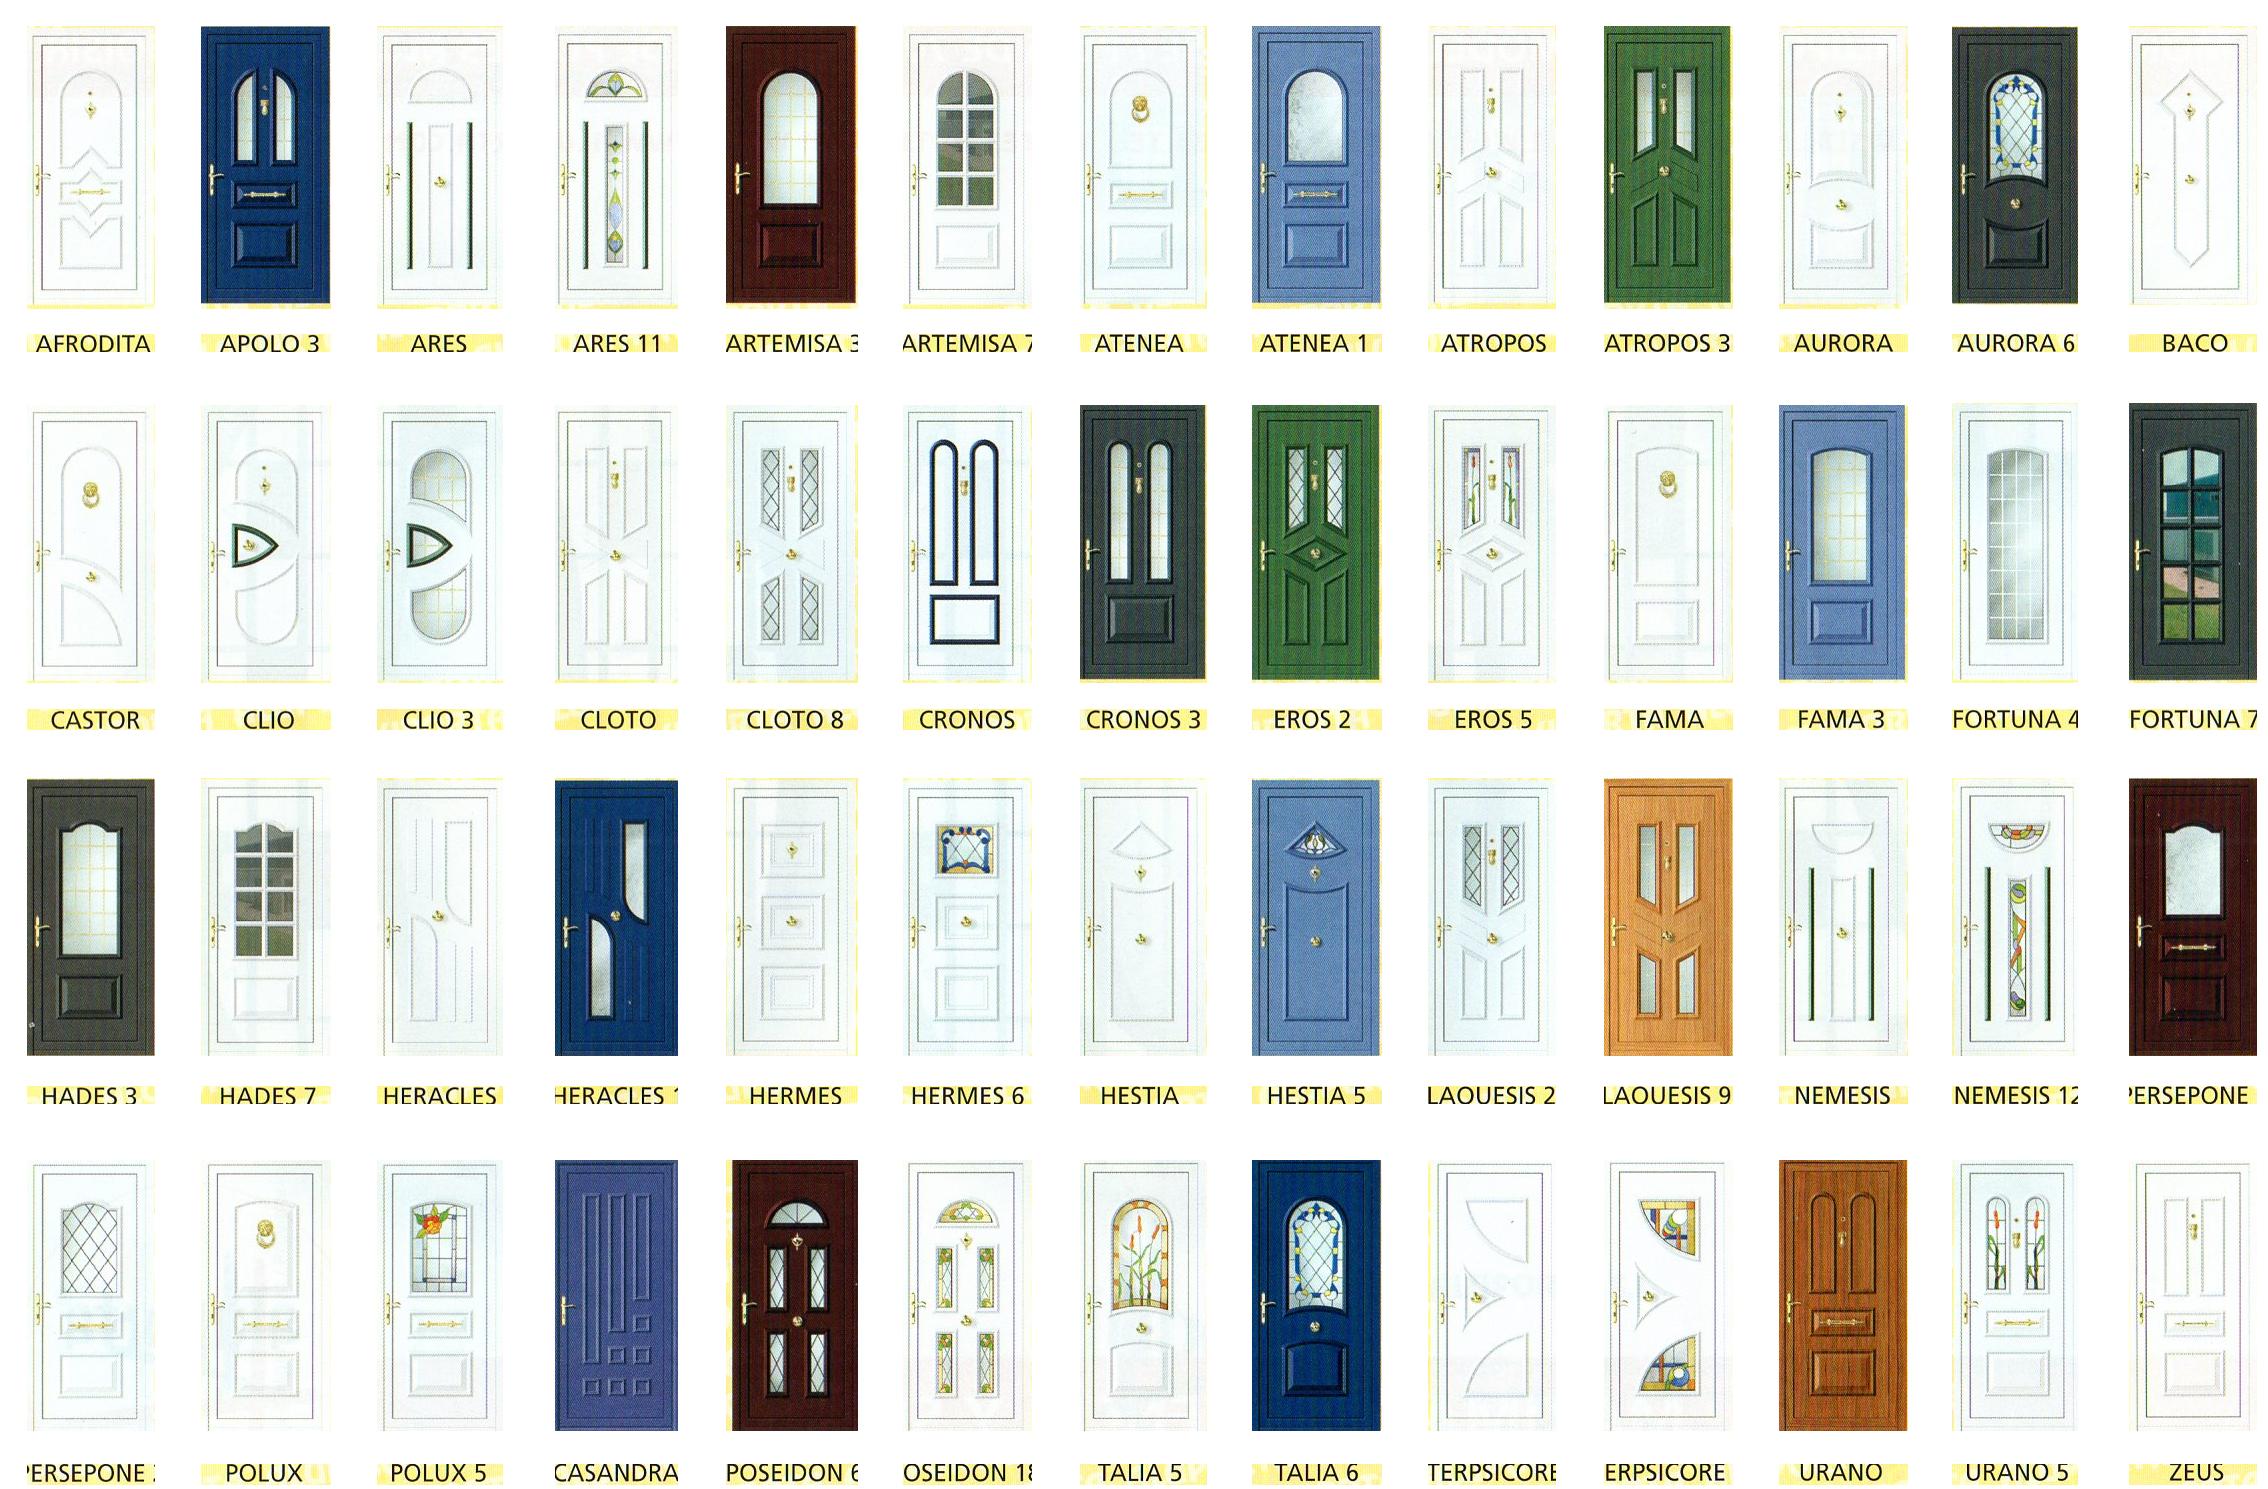 Catalogo de puertas imagui for Catalogo de puertas de madera modernas